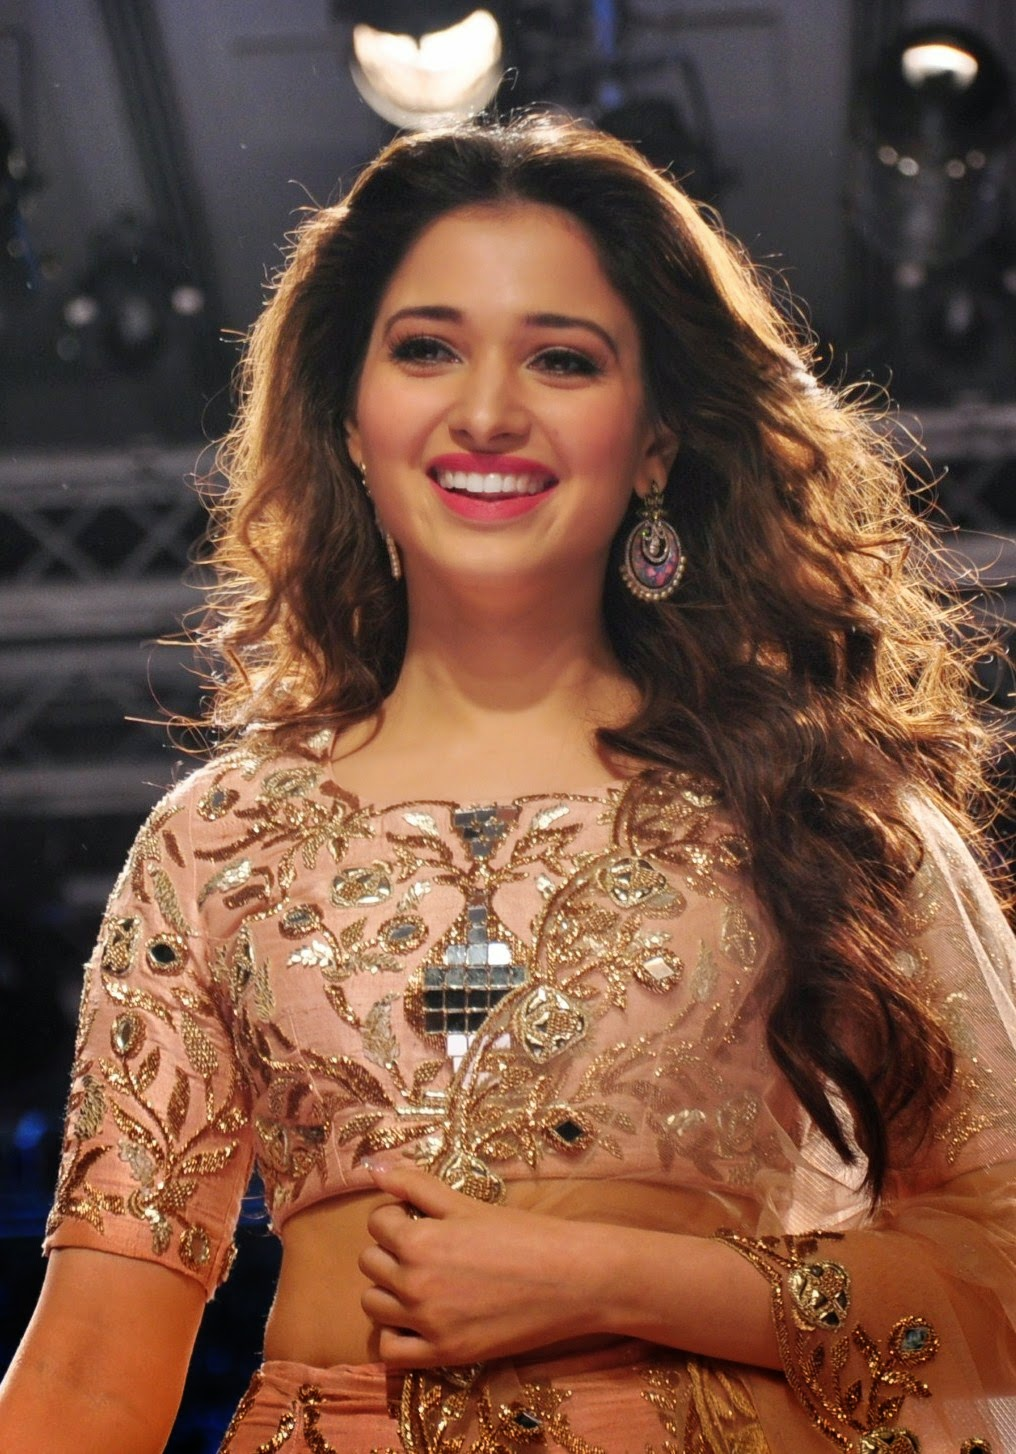 Latest Tamanna In Saree: Tamanna Bhatia Latest Photos At Lakme Fashion Week 2015